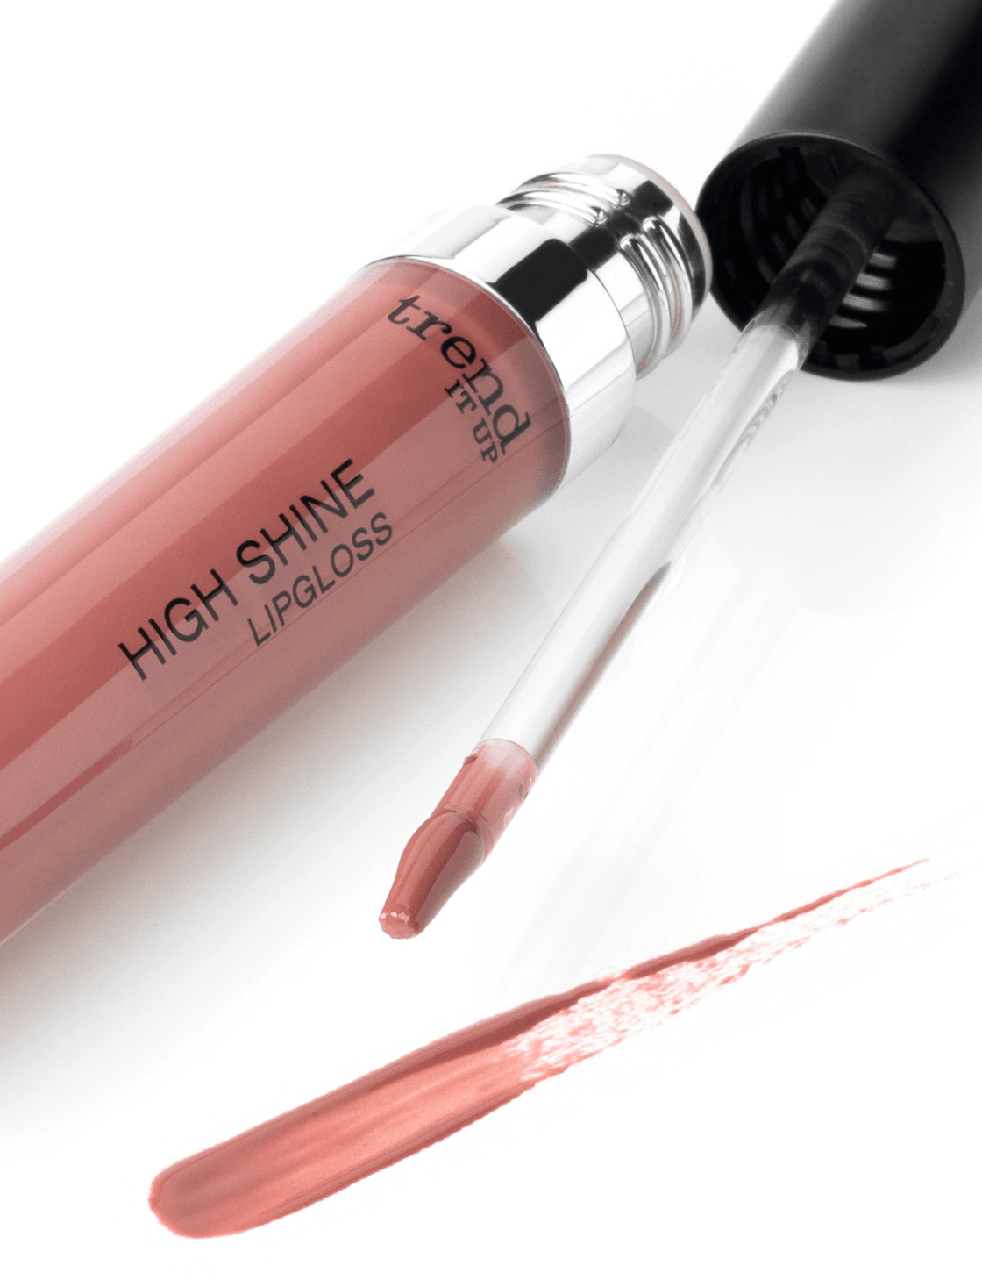 Блеск для губ trend IT UP High Shine Lipgloss 135, 5 ml